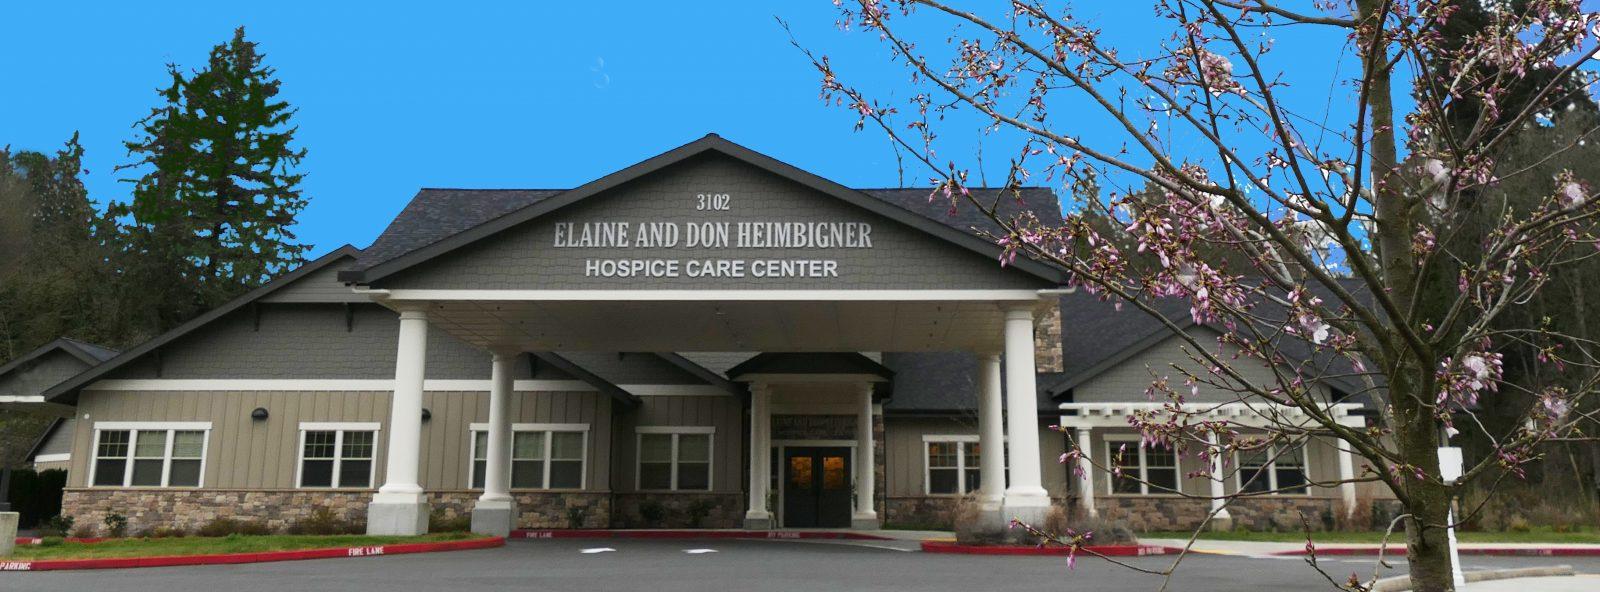 elaine-and-don-heimbigner-hospice-care-center